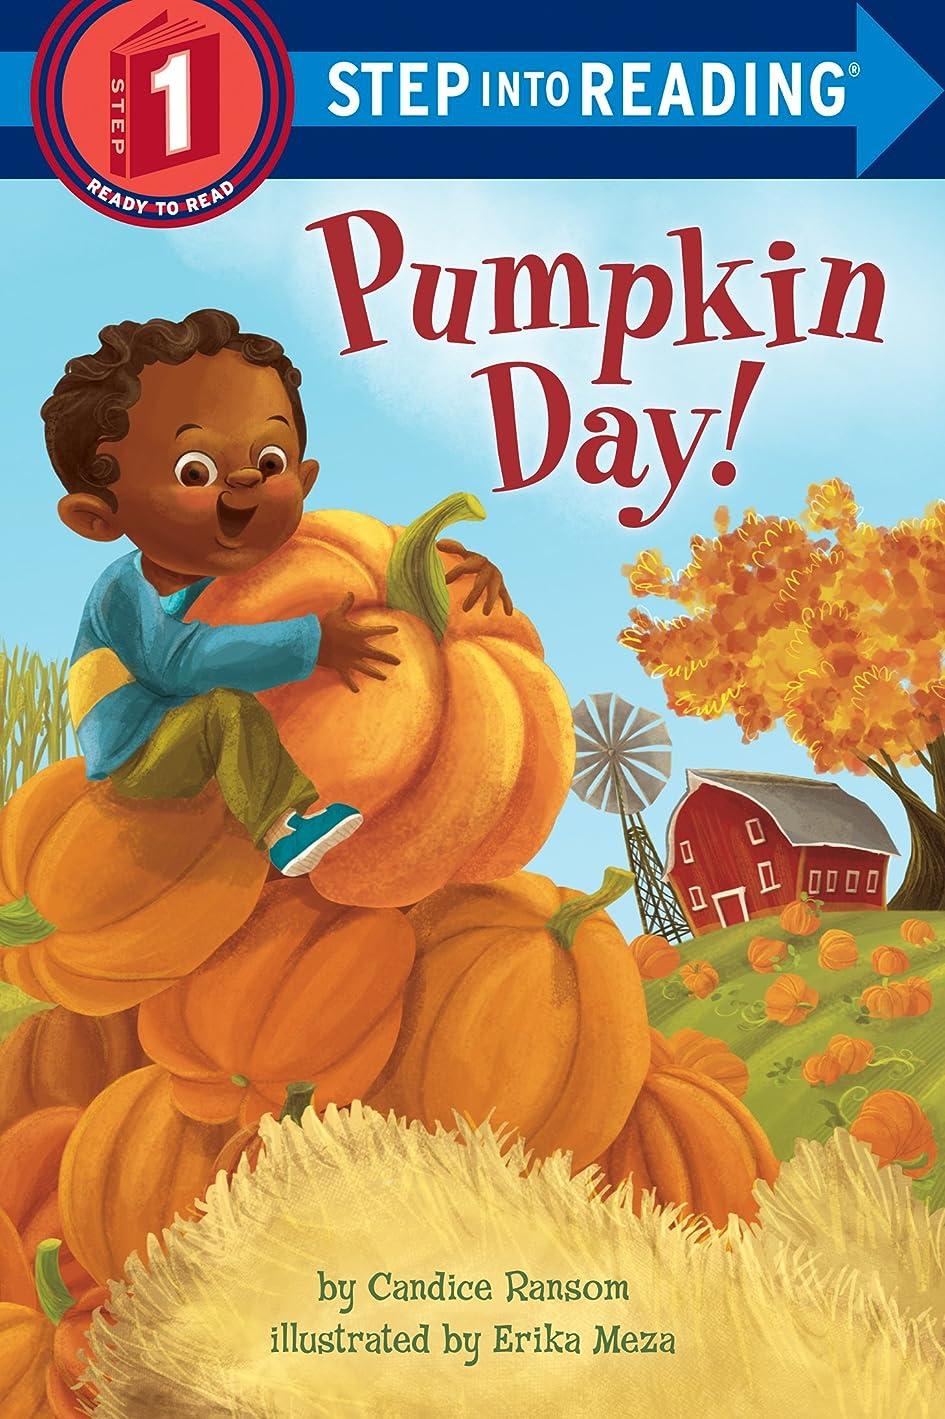 悲観主義者転送恐怖症Pumpkin Day! (Step into Reading) (English Edition)